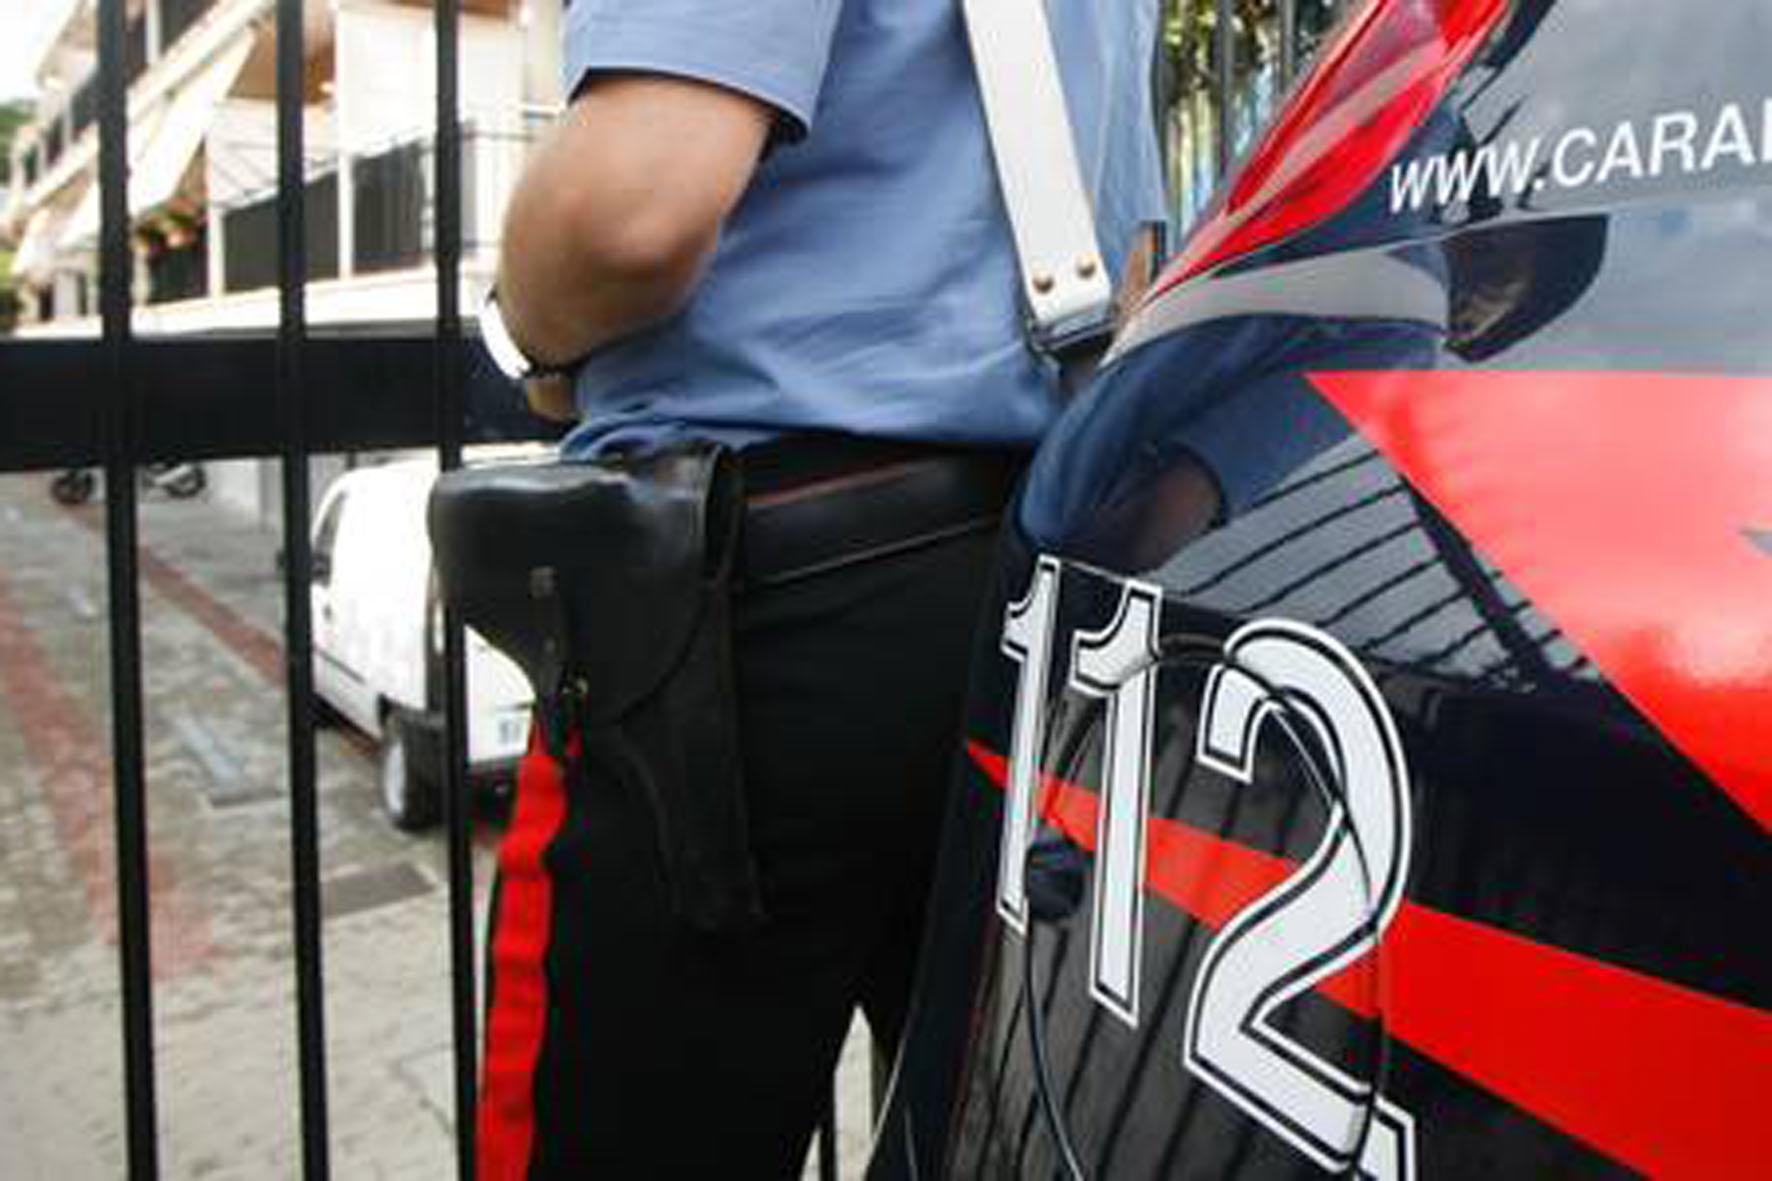 Roma, appalti truccati nella sanità: arrestati dirigenti Asl